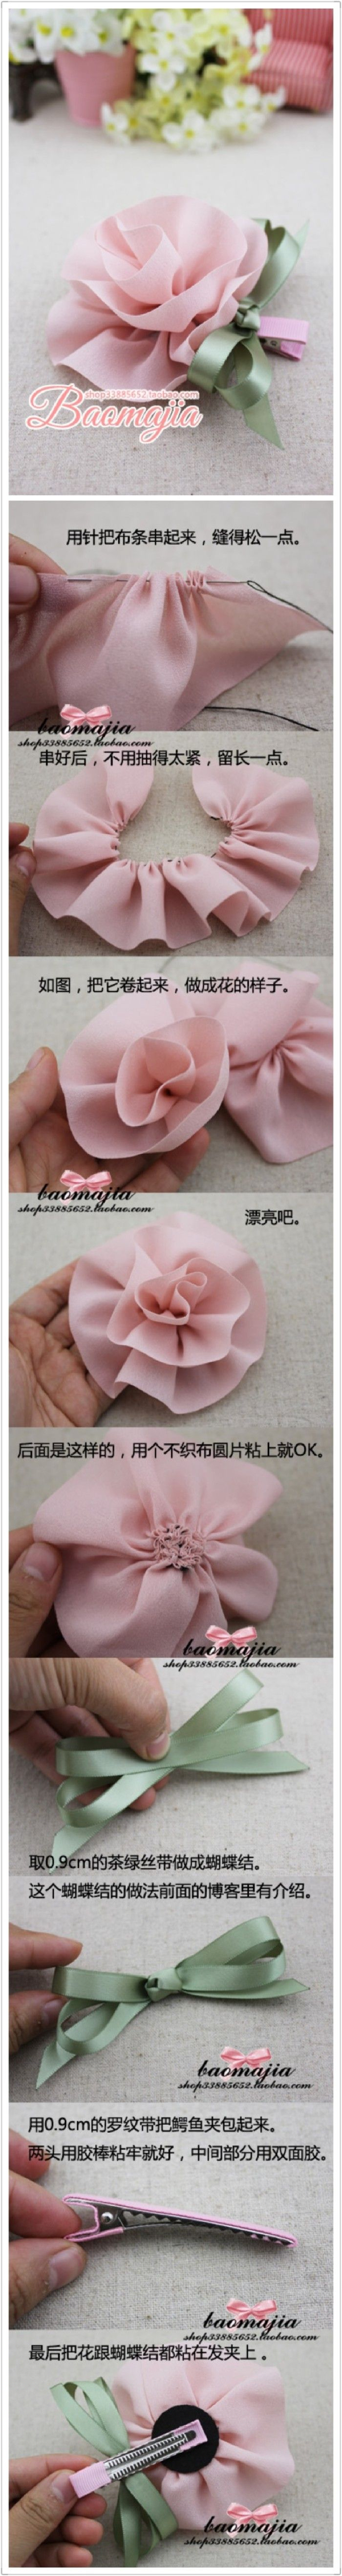 pretty fabric flowers to make